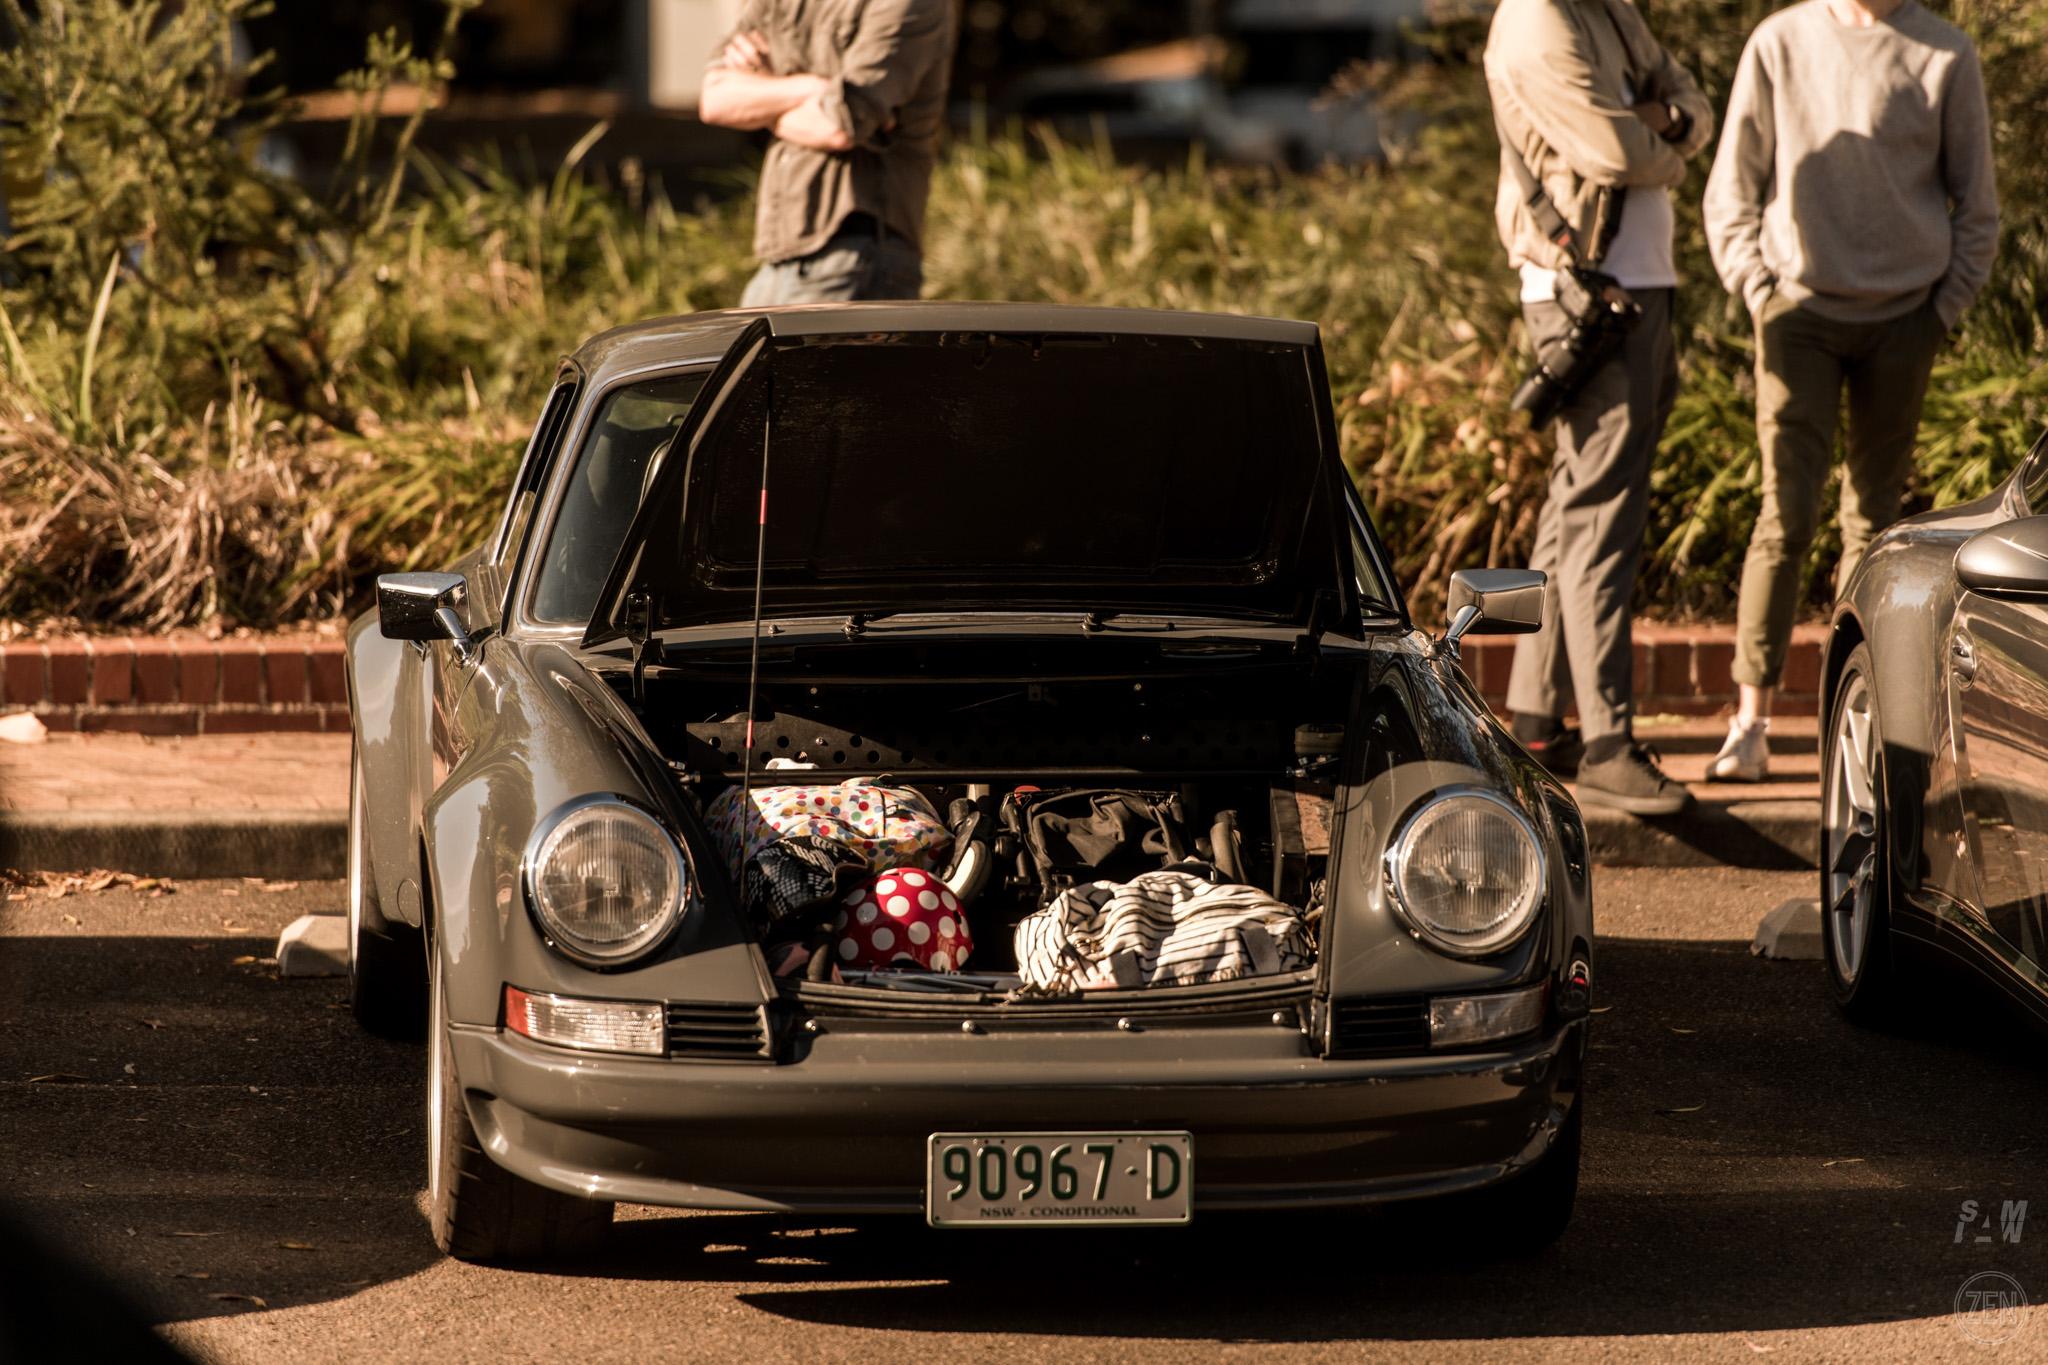 2019-10-27 - Autohaus Porsches & Coffee 141